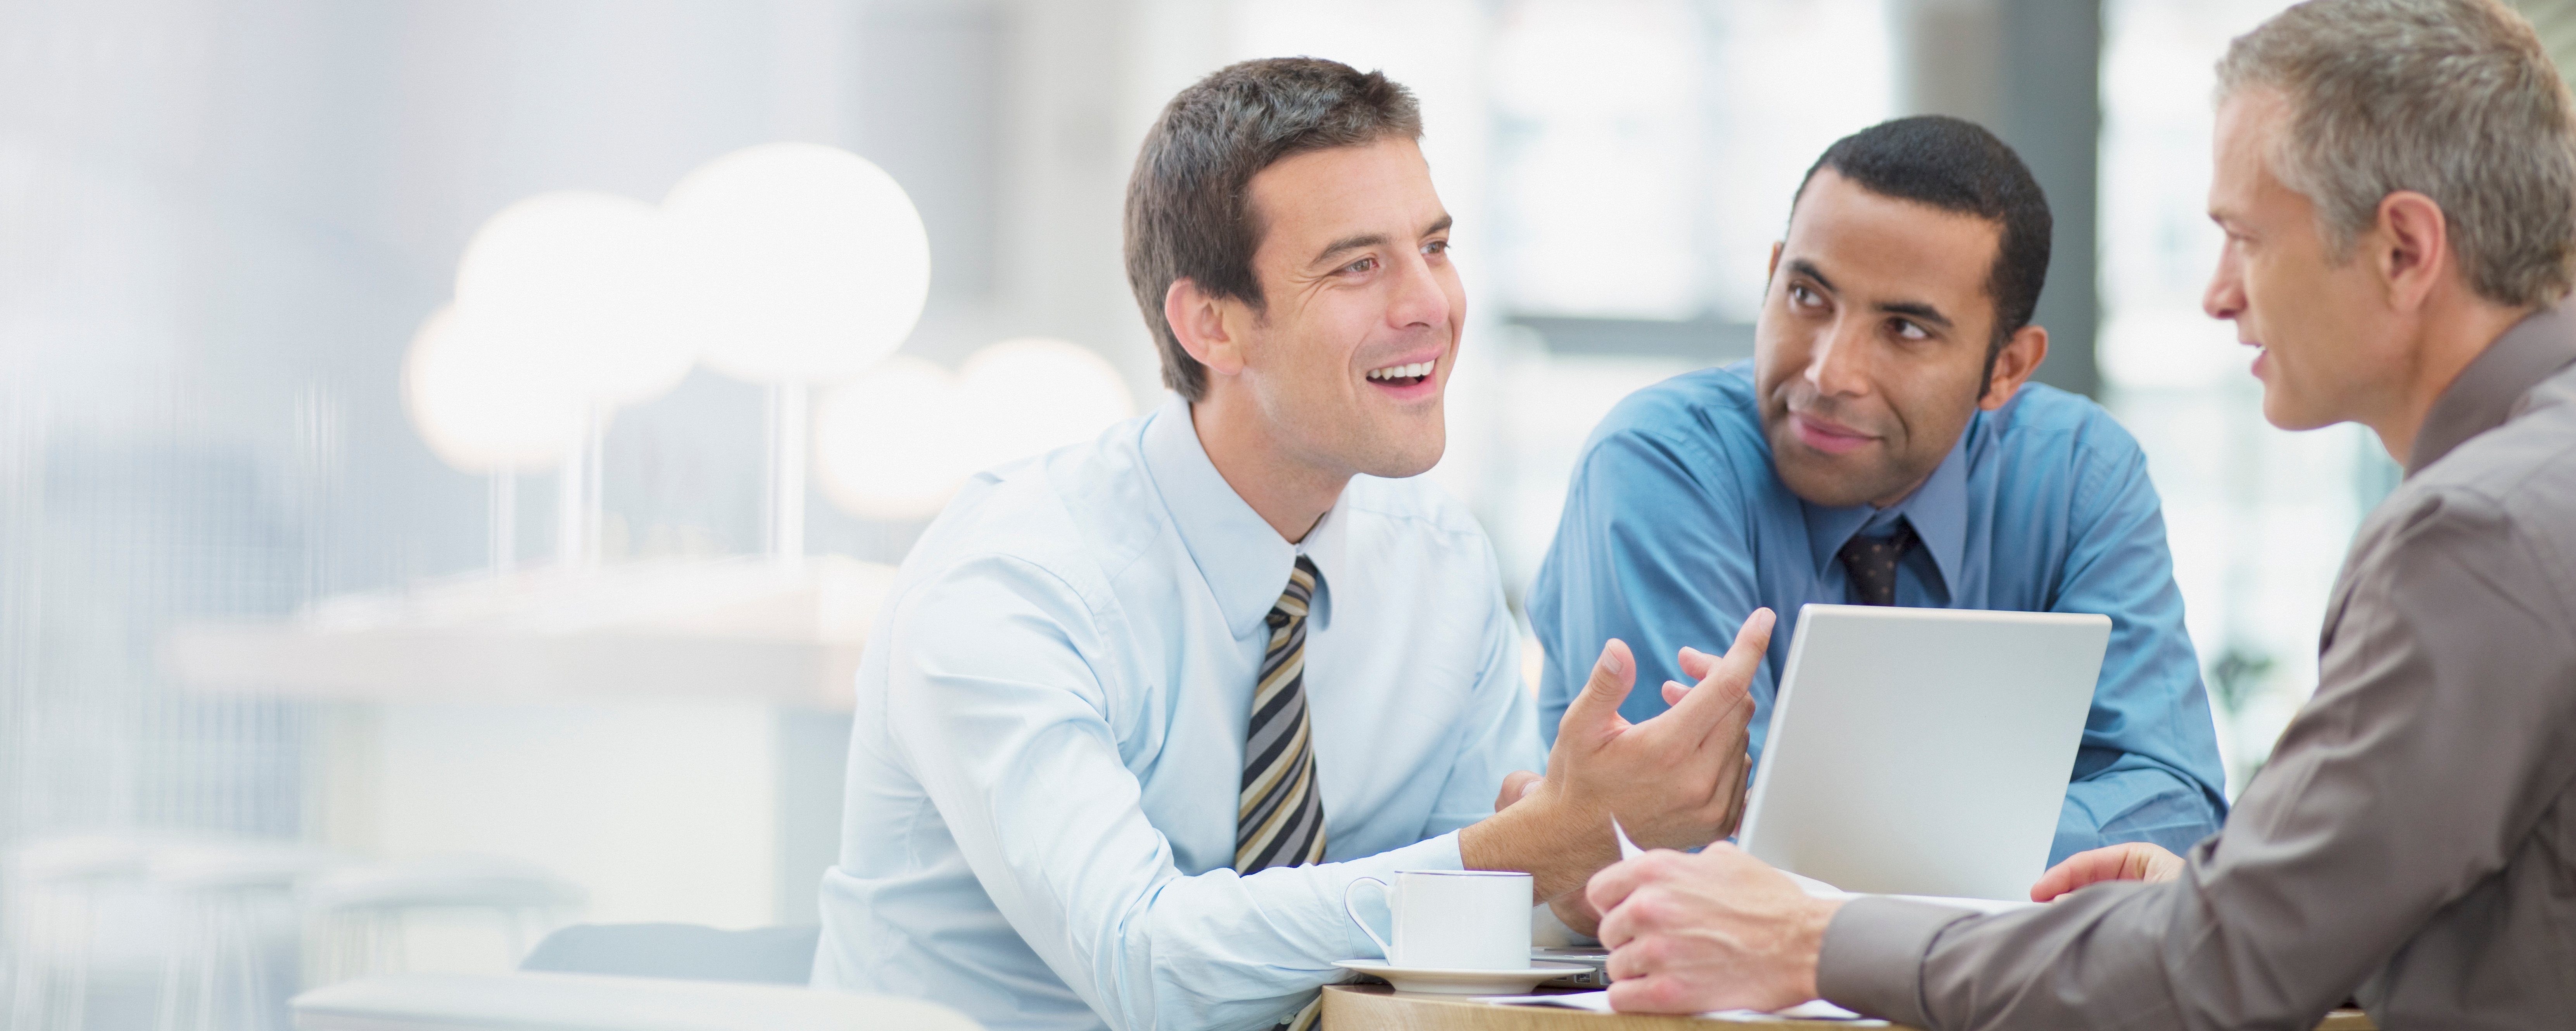 CFO is changing roles.jpg